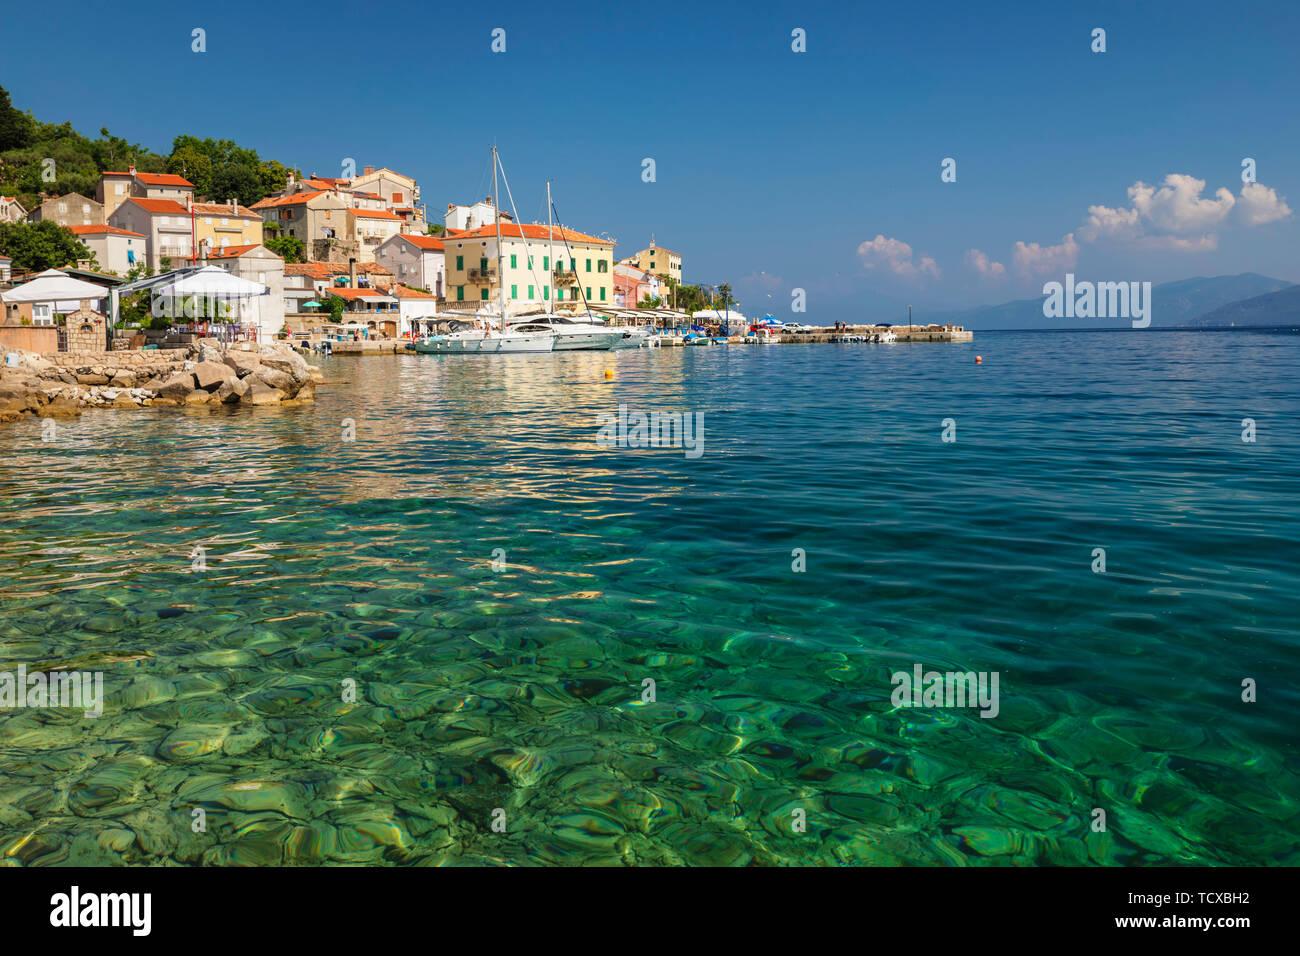 Valun, Cres Island, Kvarner Gulf, Croatia, Europe Stock Photo